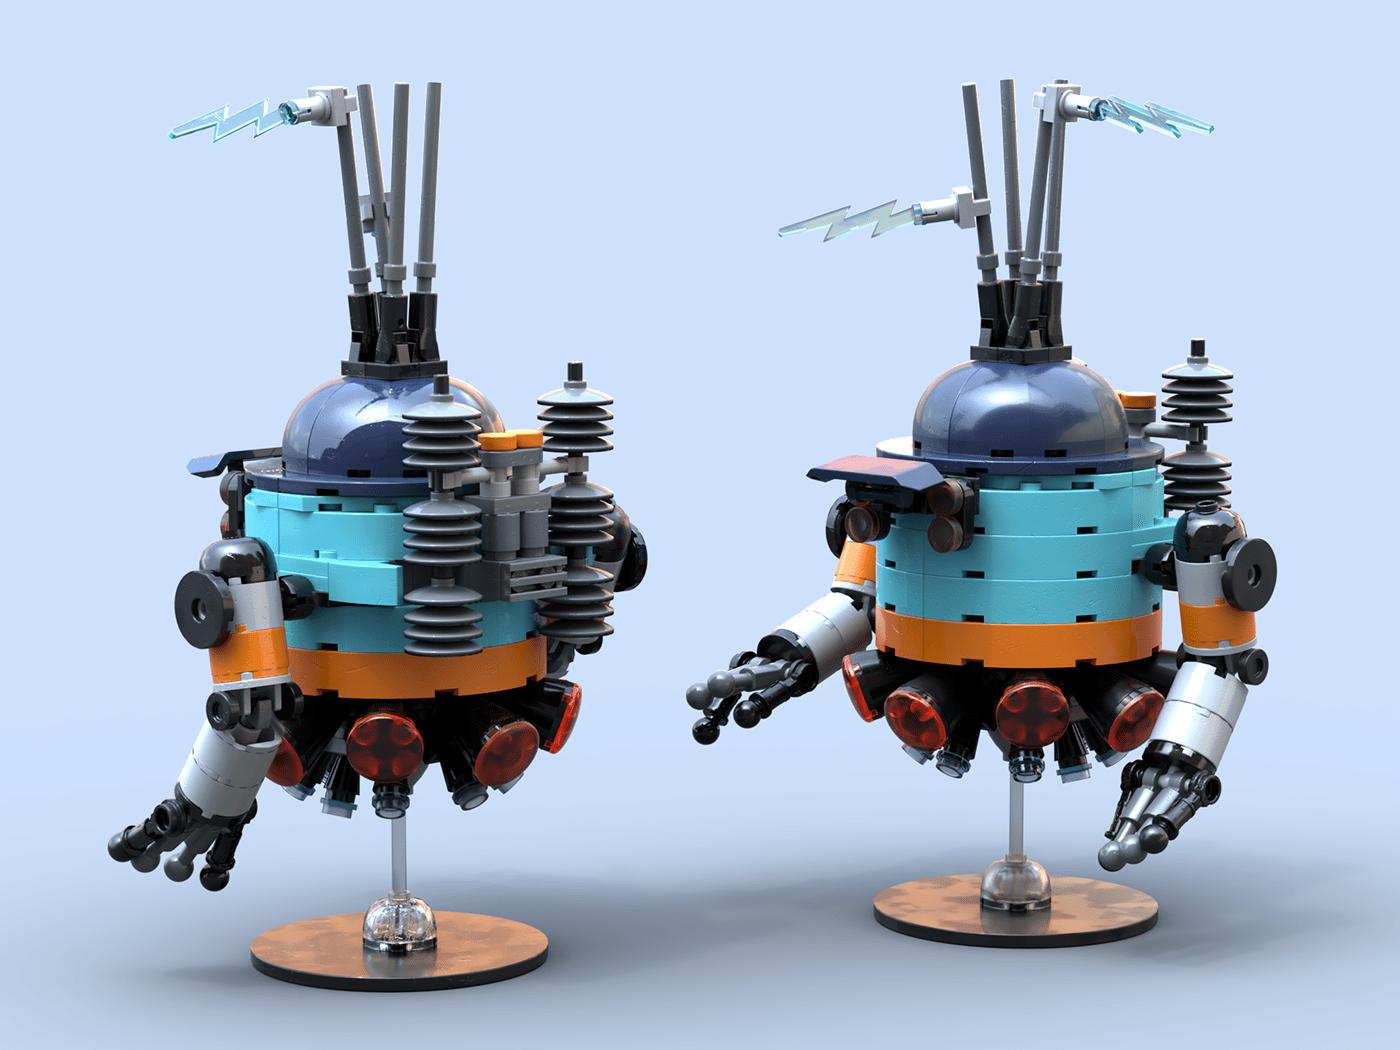 robots STEAMPUNK LEGO toys industrial design  toy design  models spaceship hotrod arcade